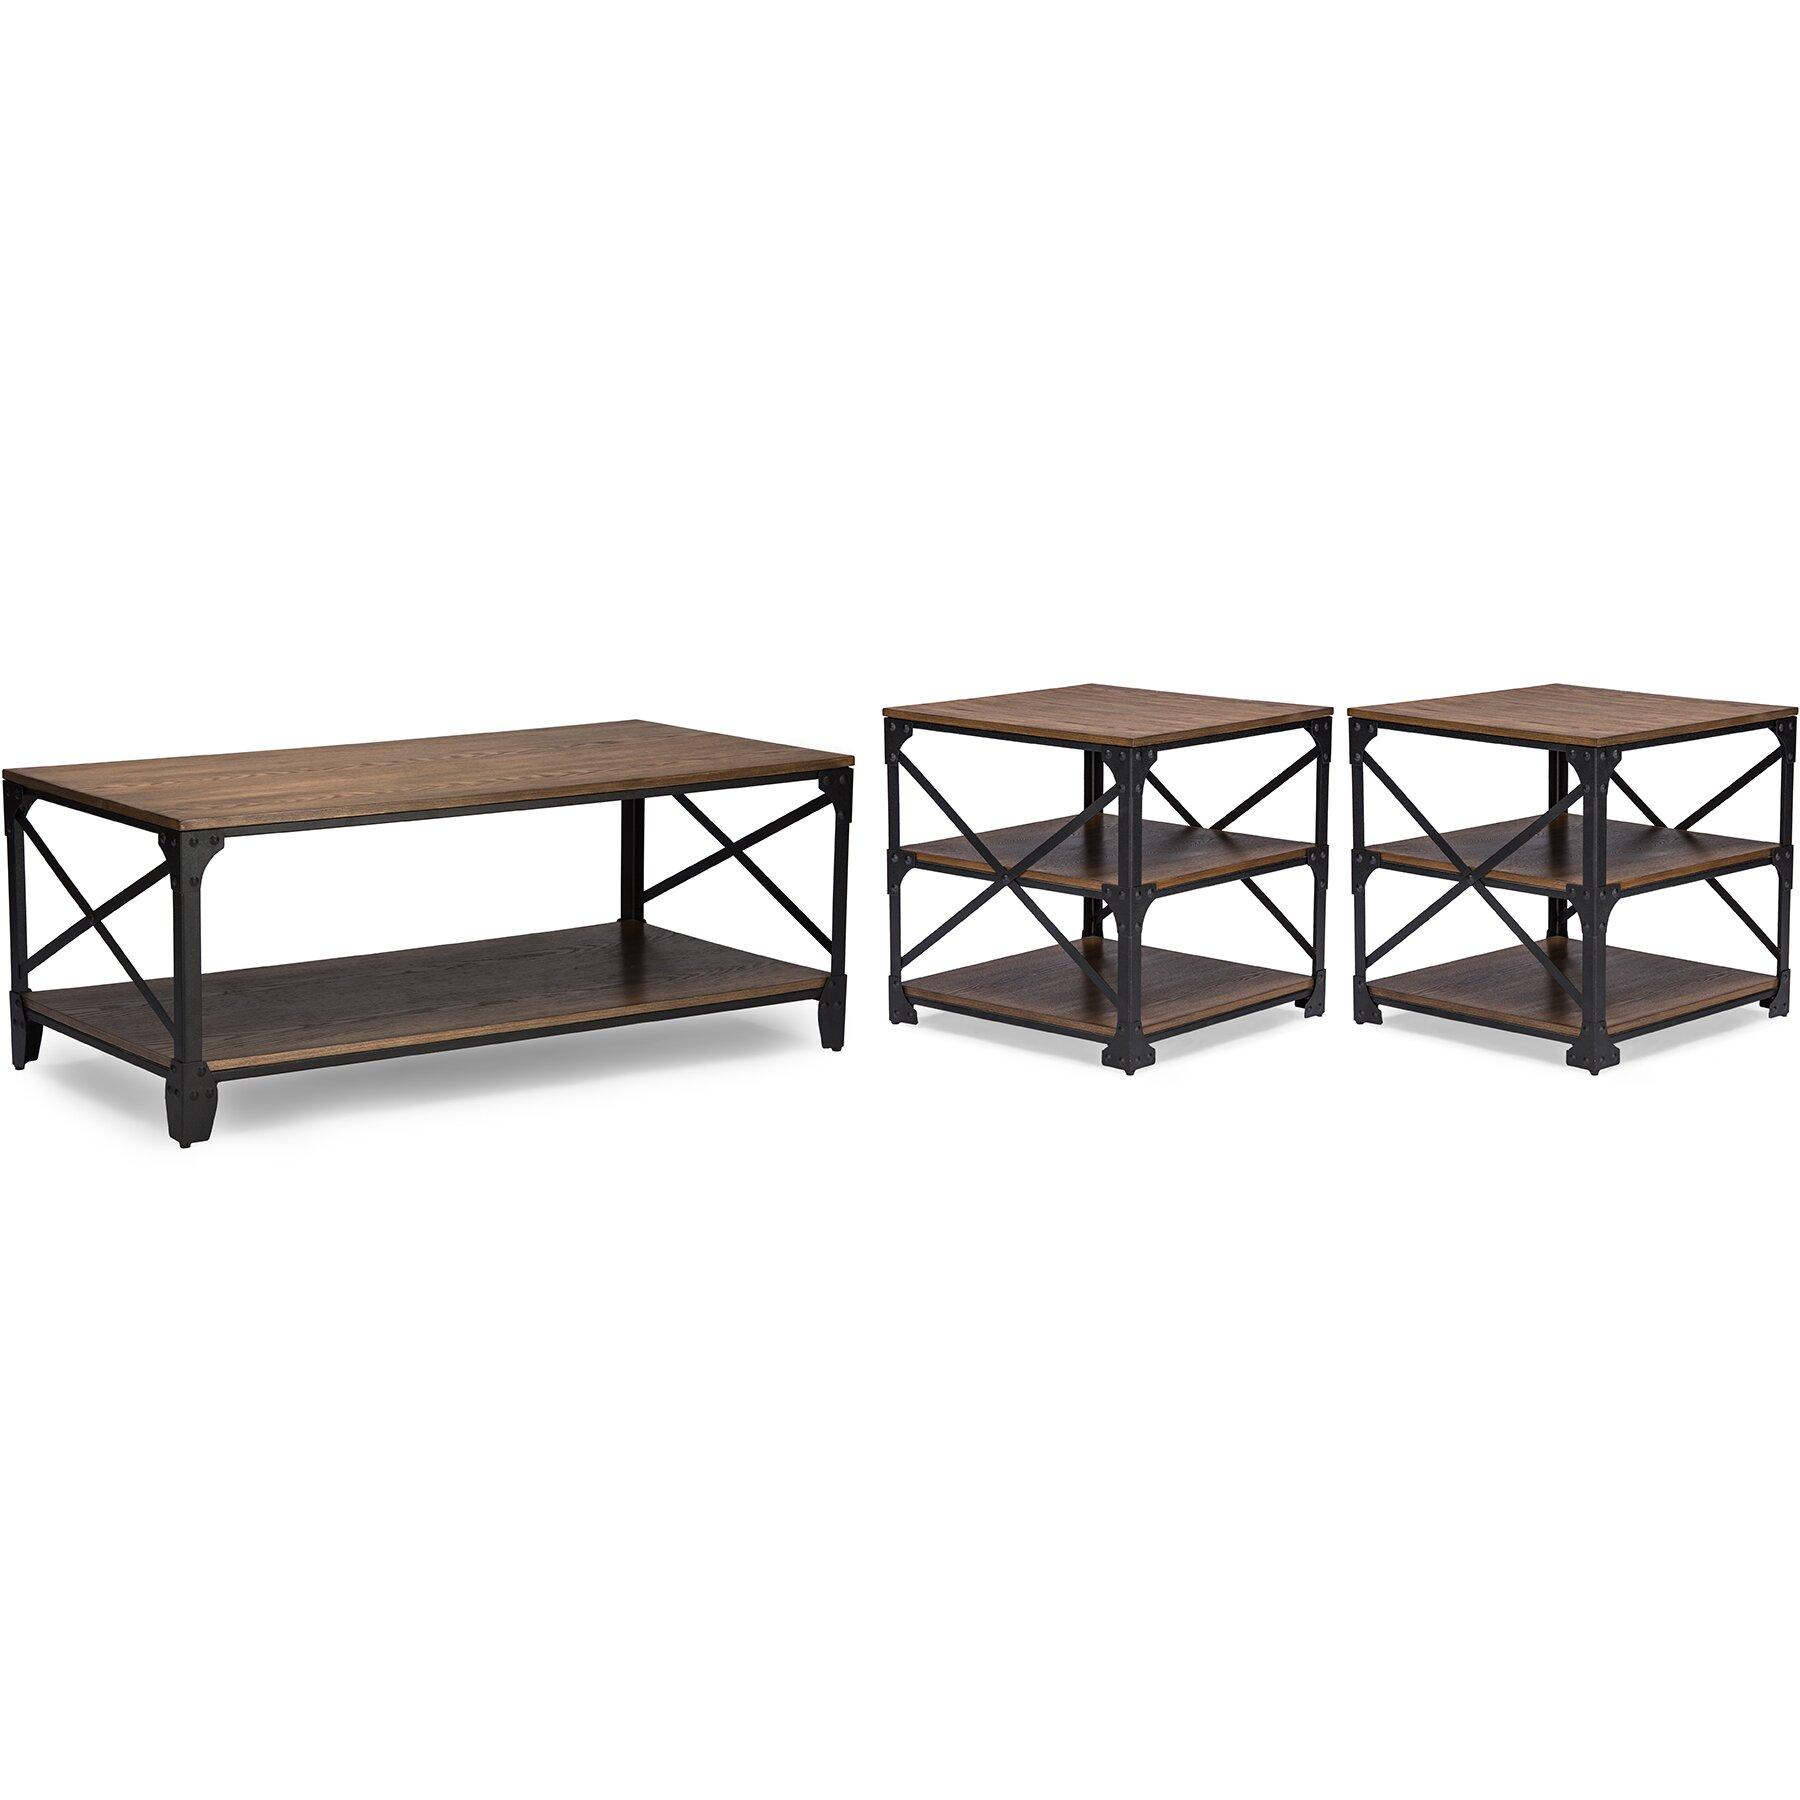 Bronze Industrial Coffee Table: Baxton Studio 3 Piece Coffee Table Set